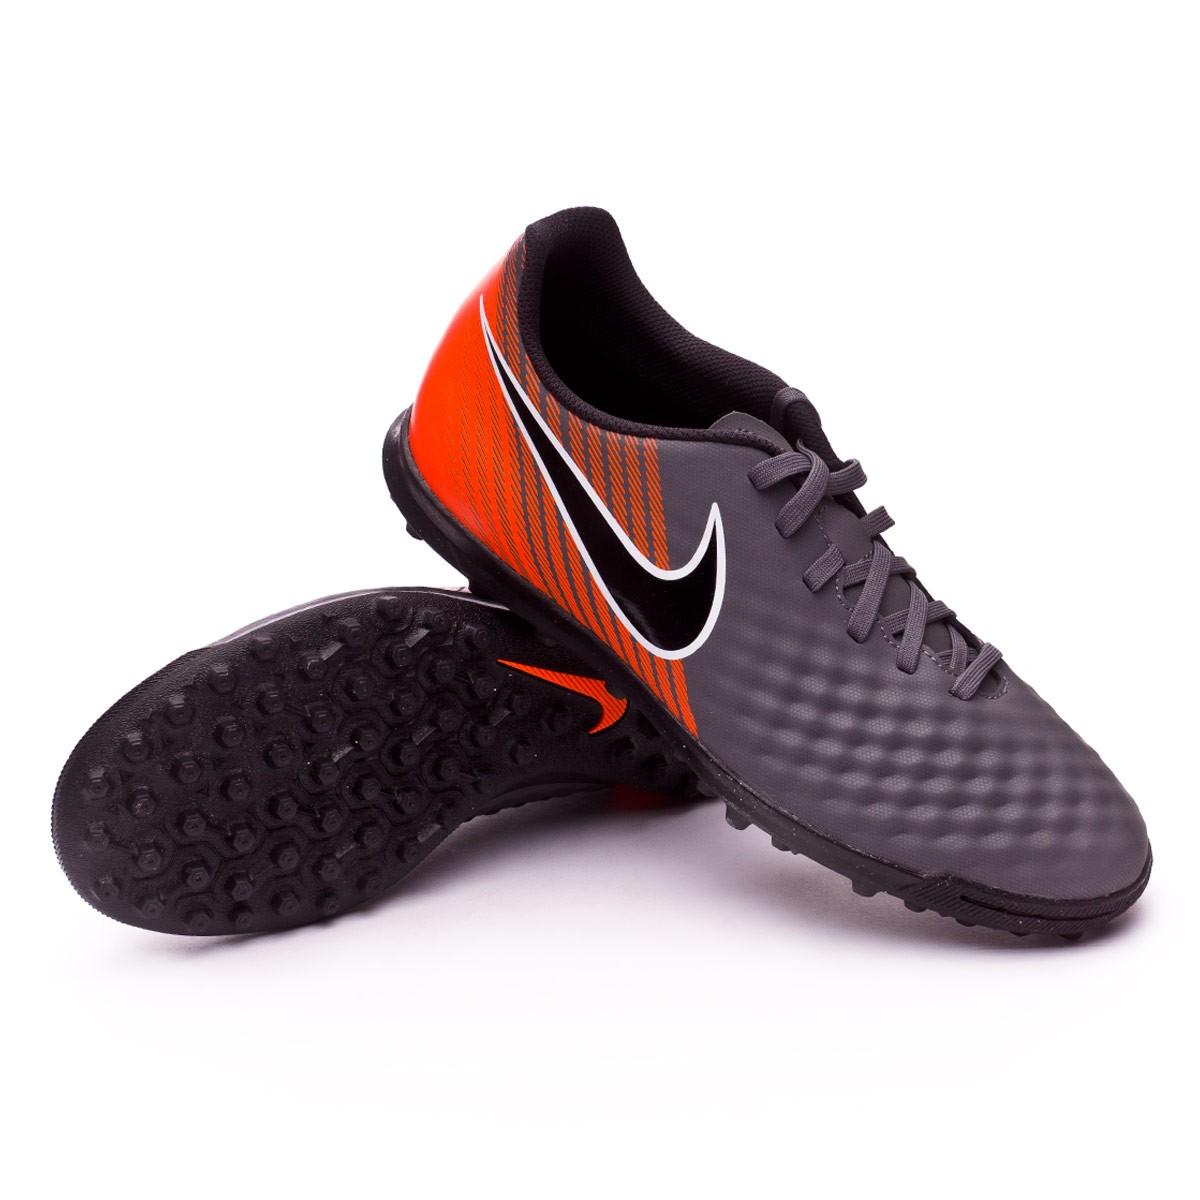 low priced 0a642 13109 Zapatilla Magista ObraX II Club Turf Dark grey-Black-Total orange-White